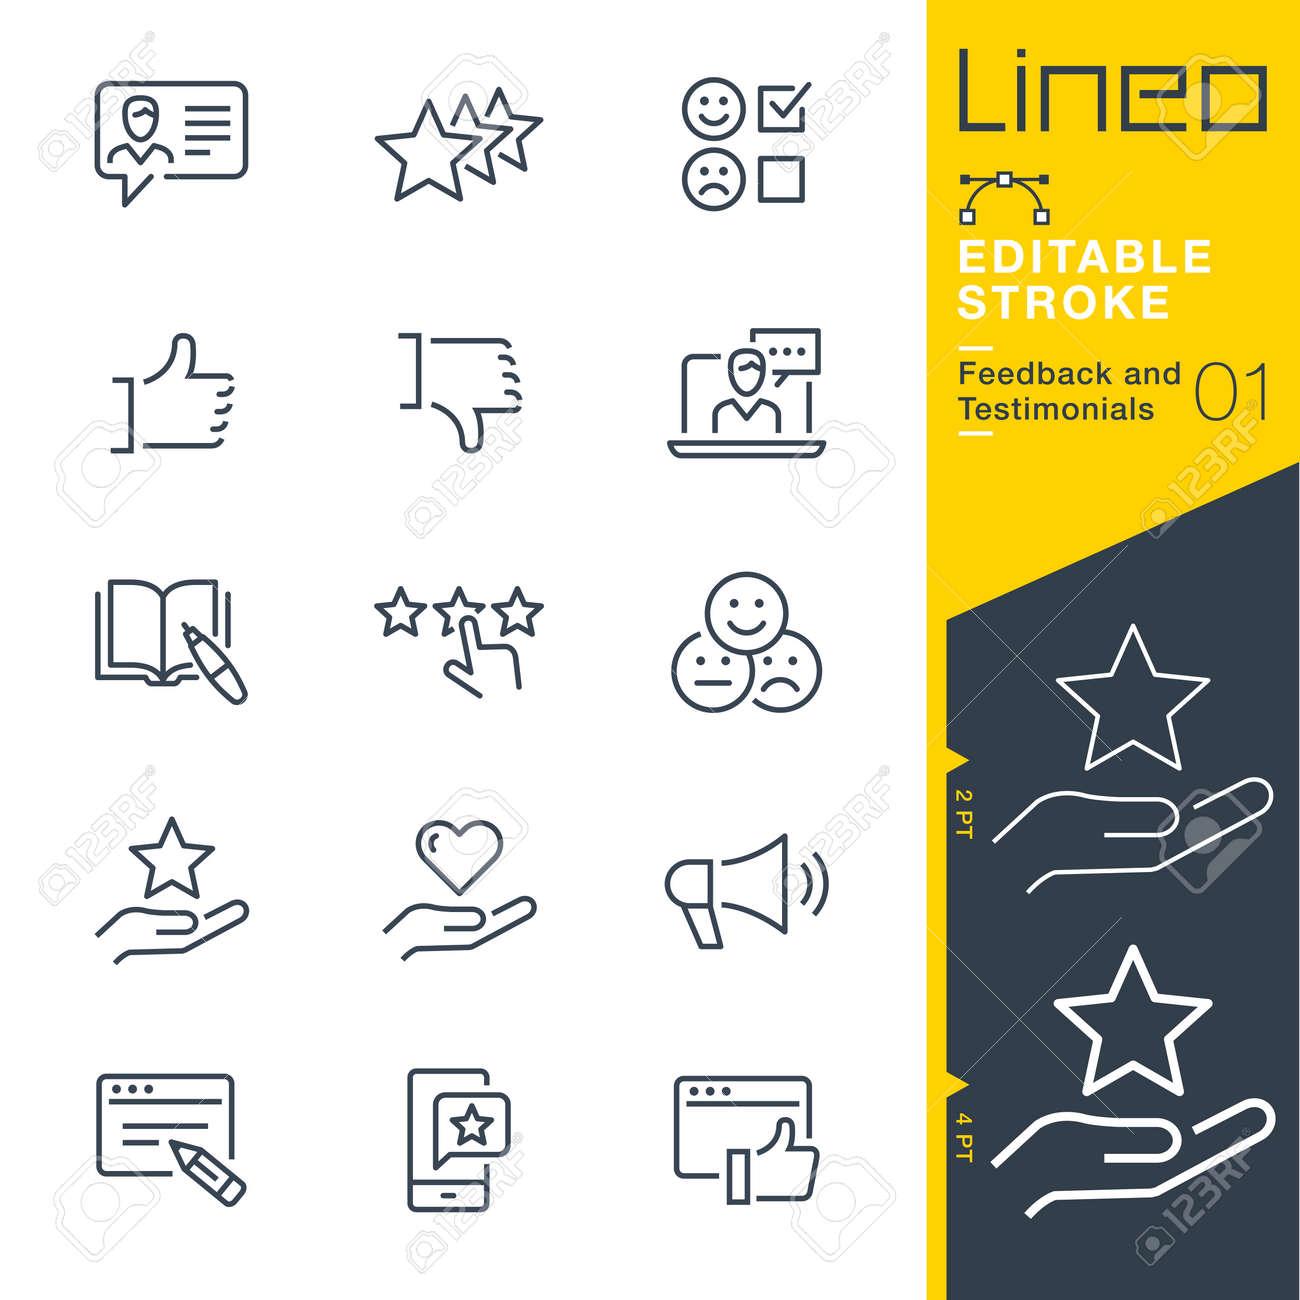 Lineo Editable Stroke - Feedback and Testimonials line icons - 104206454